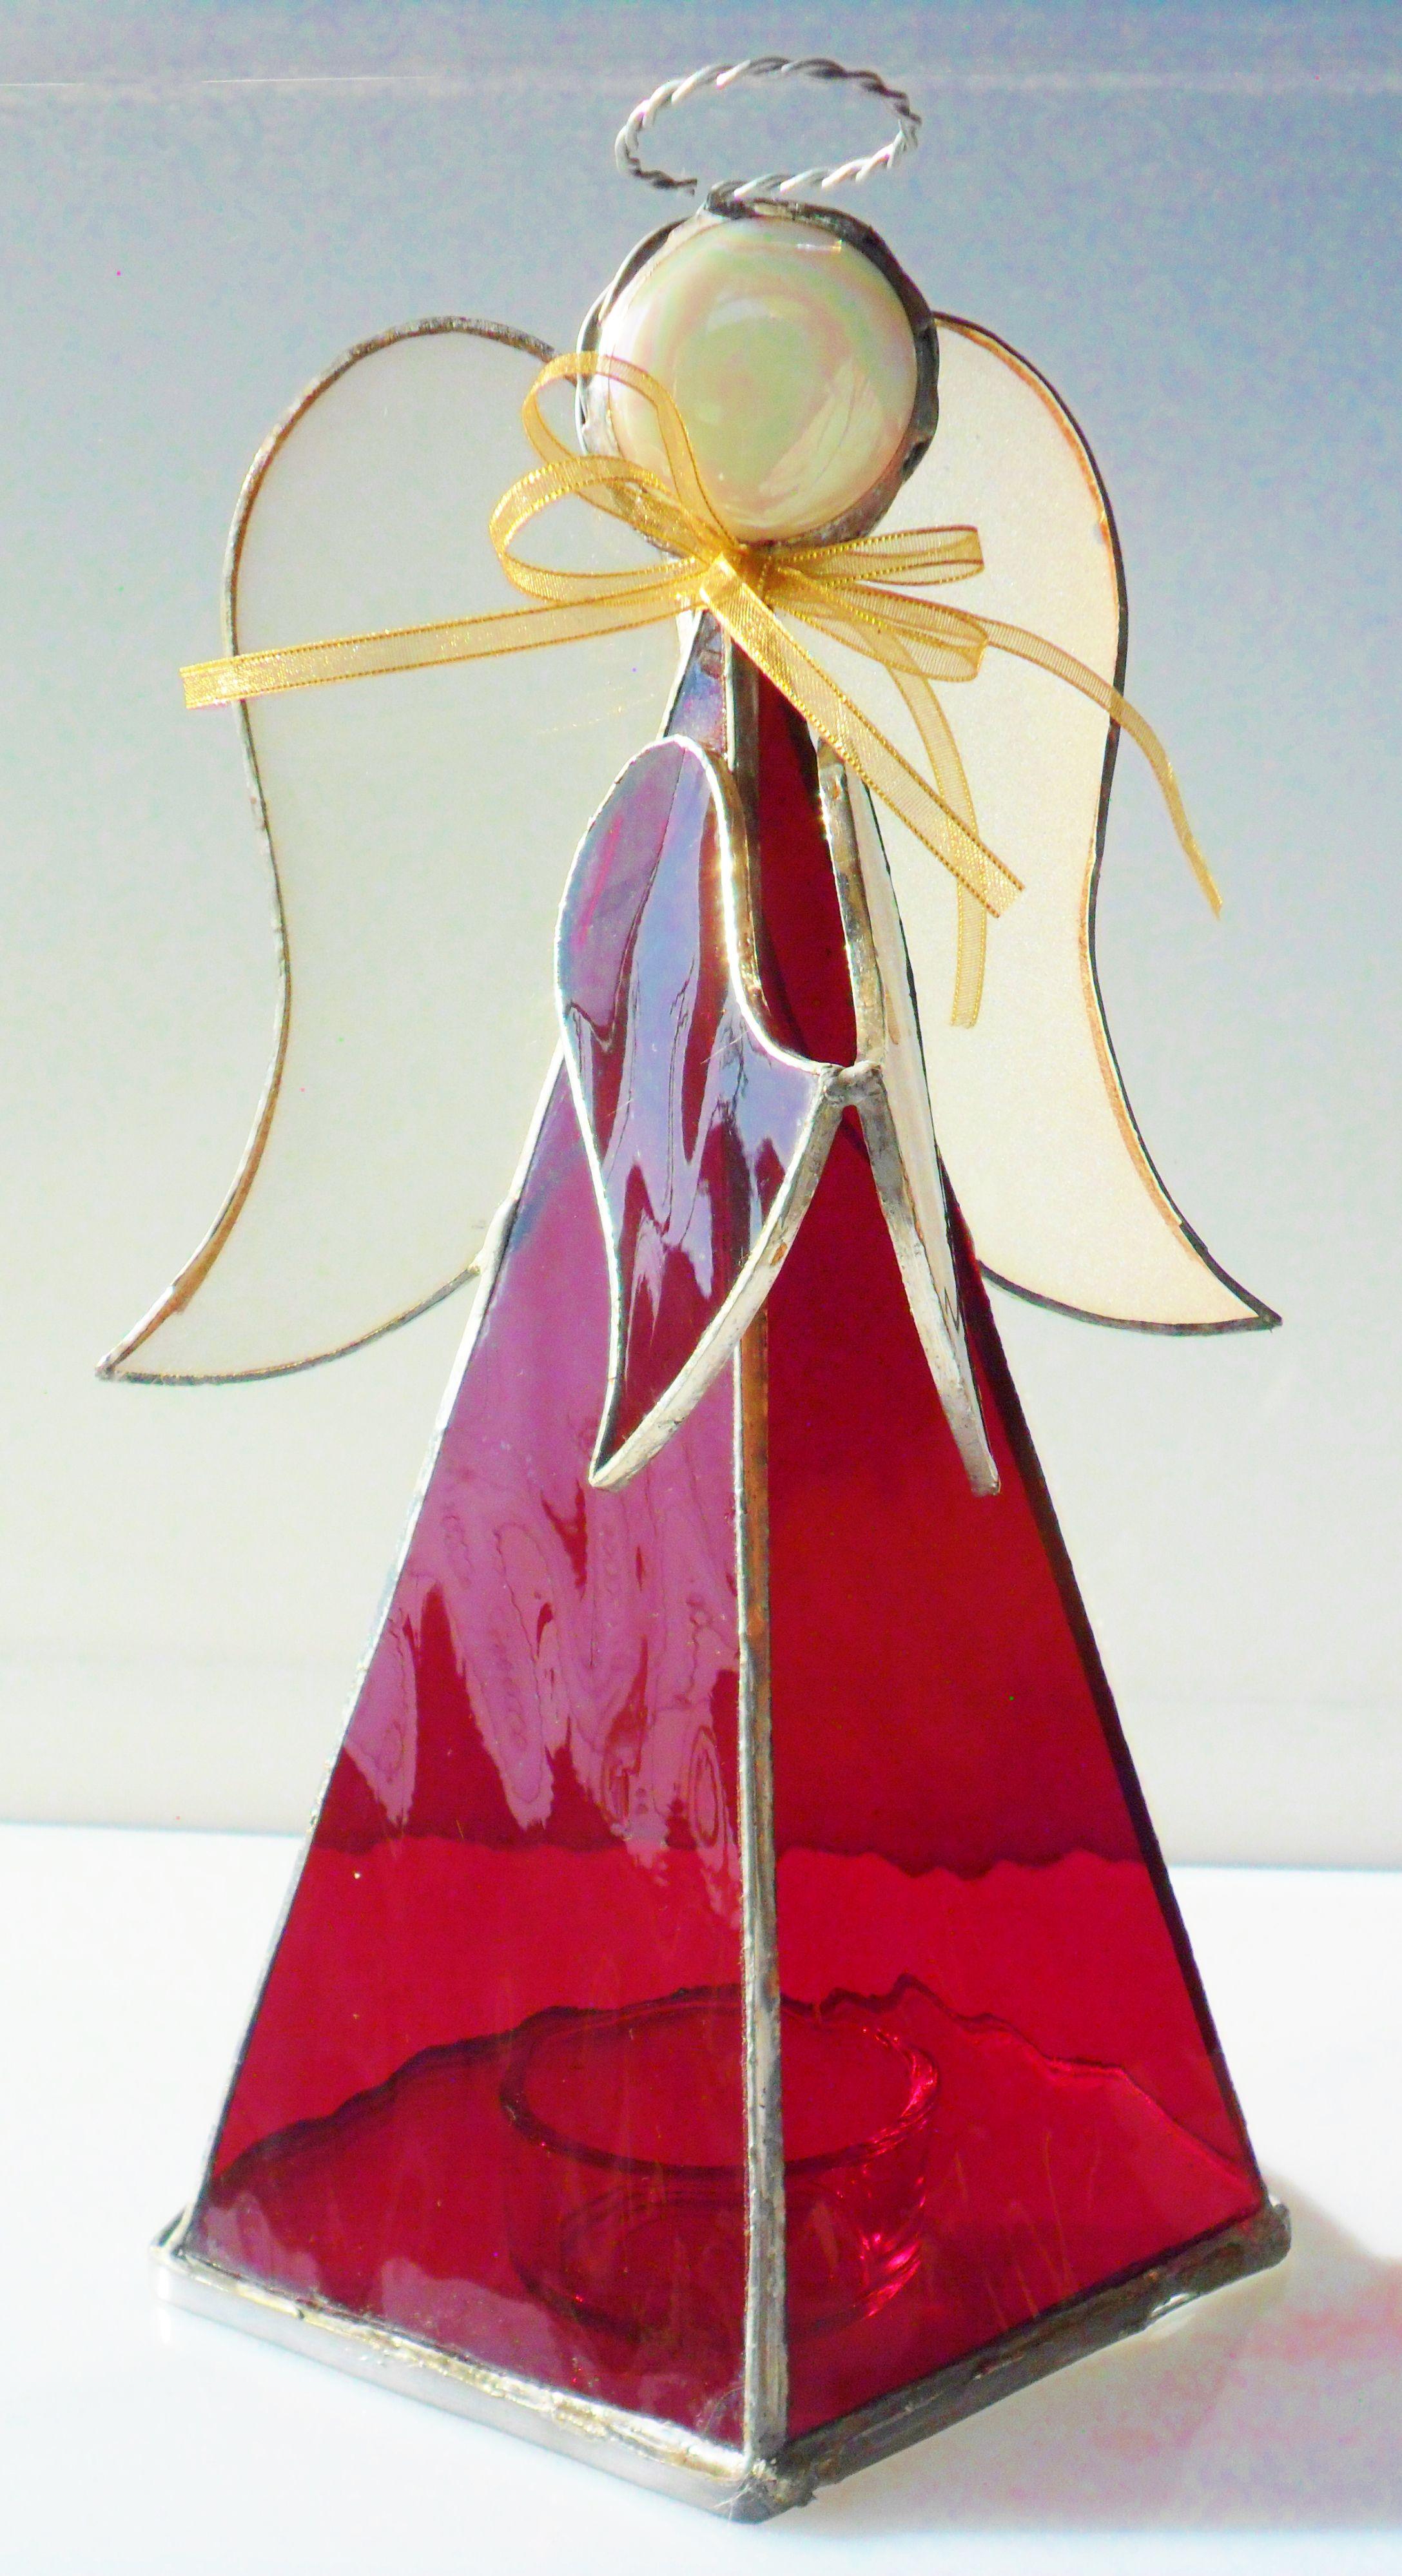 Angel rojo en vitral. | Candle holders | Pinterest | Glas, Engelchen ...